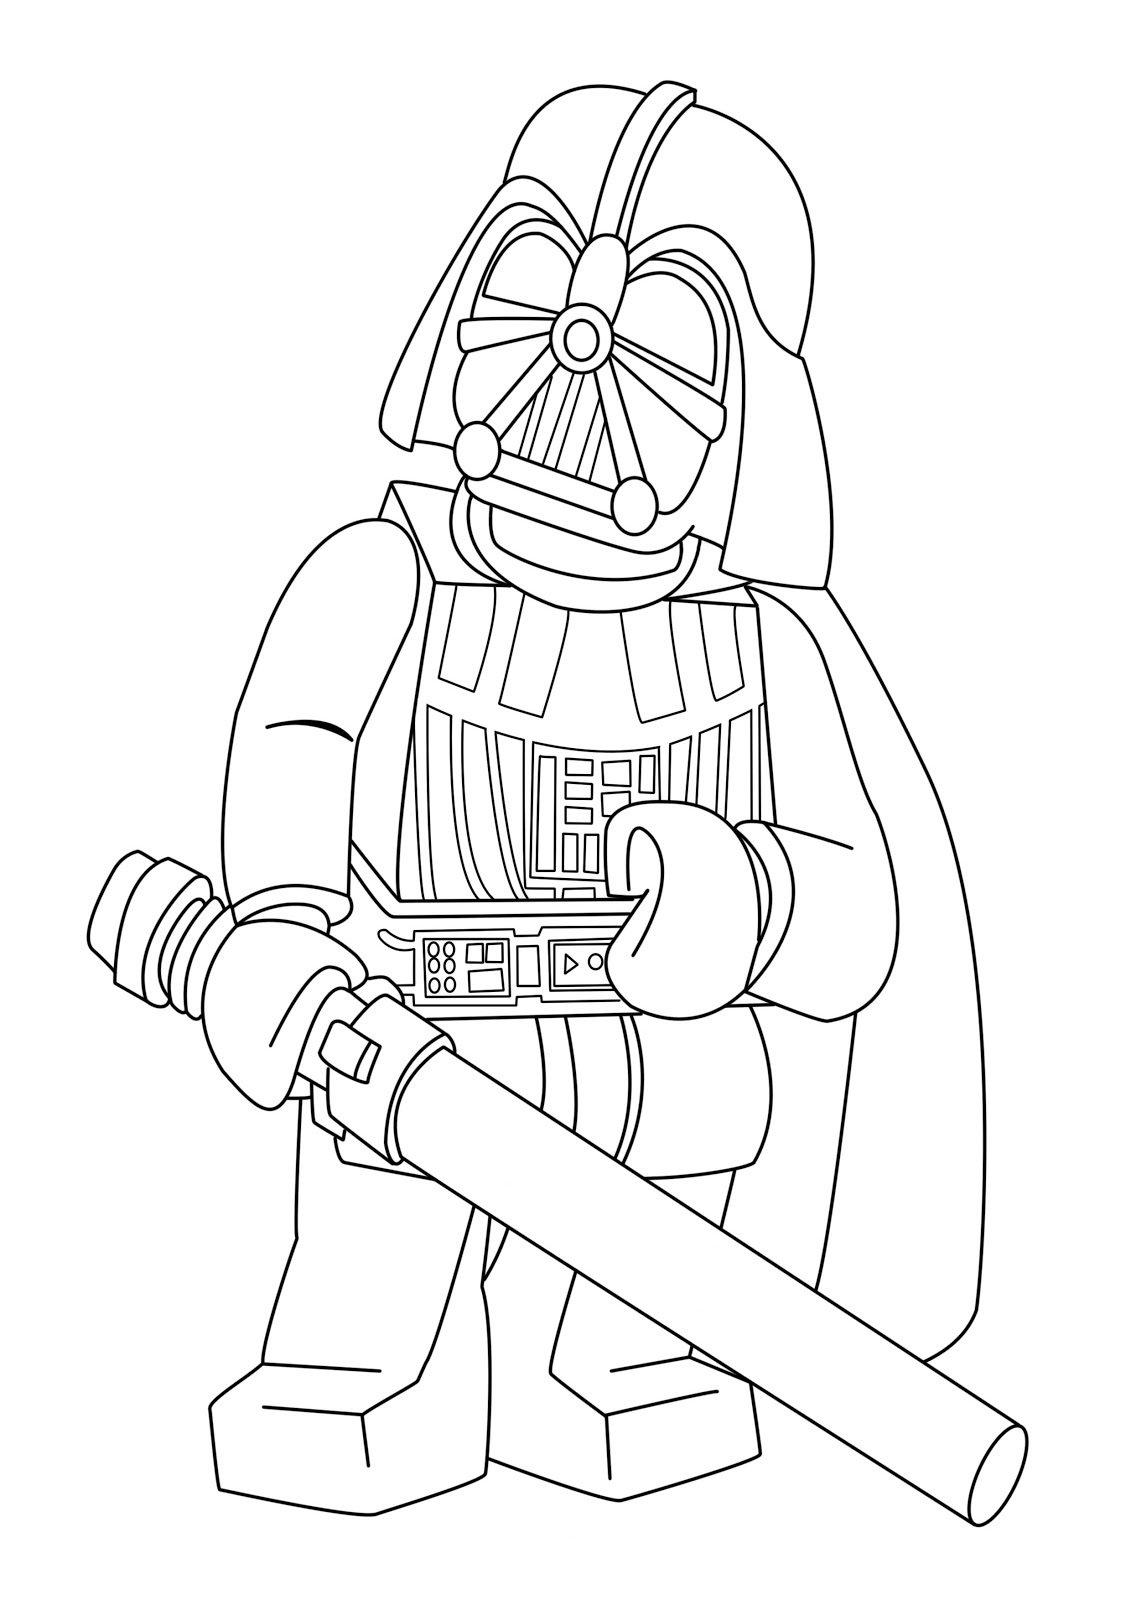 Desenhos Para Colorir Star Wars Lego No Jogos Online Wx